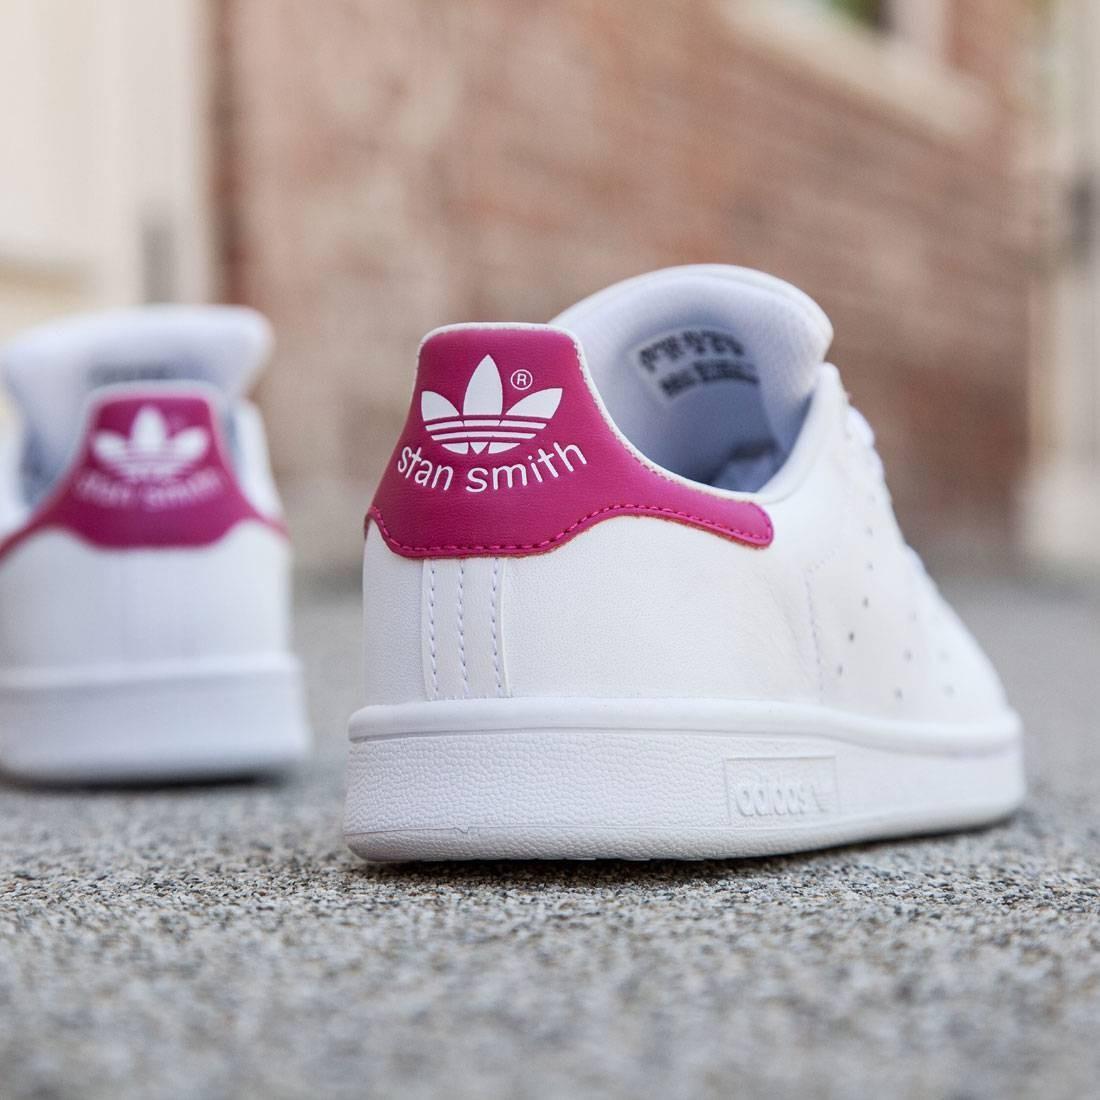 adidas ragazzi bianchi / stan smith (grassetto bianco rosa